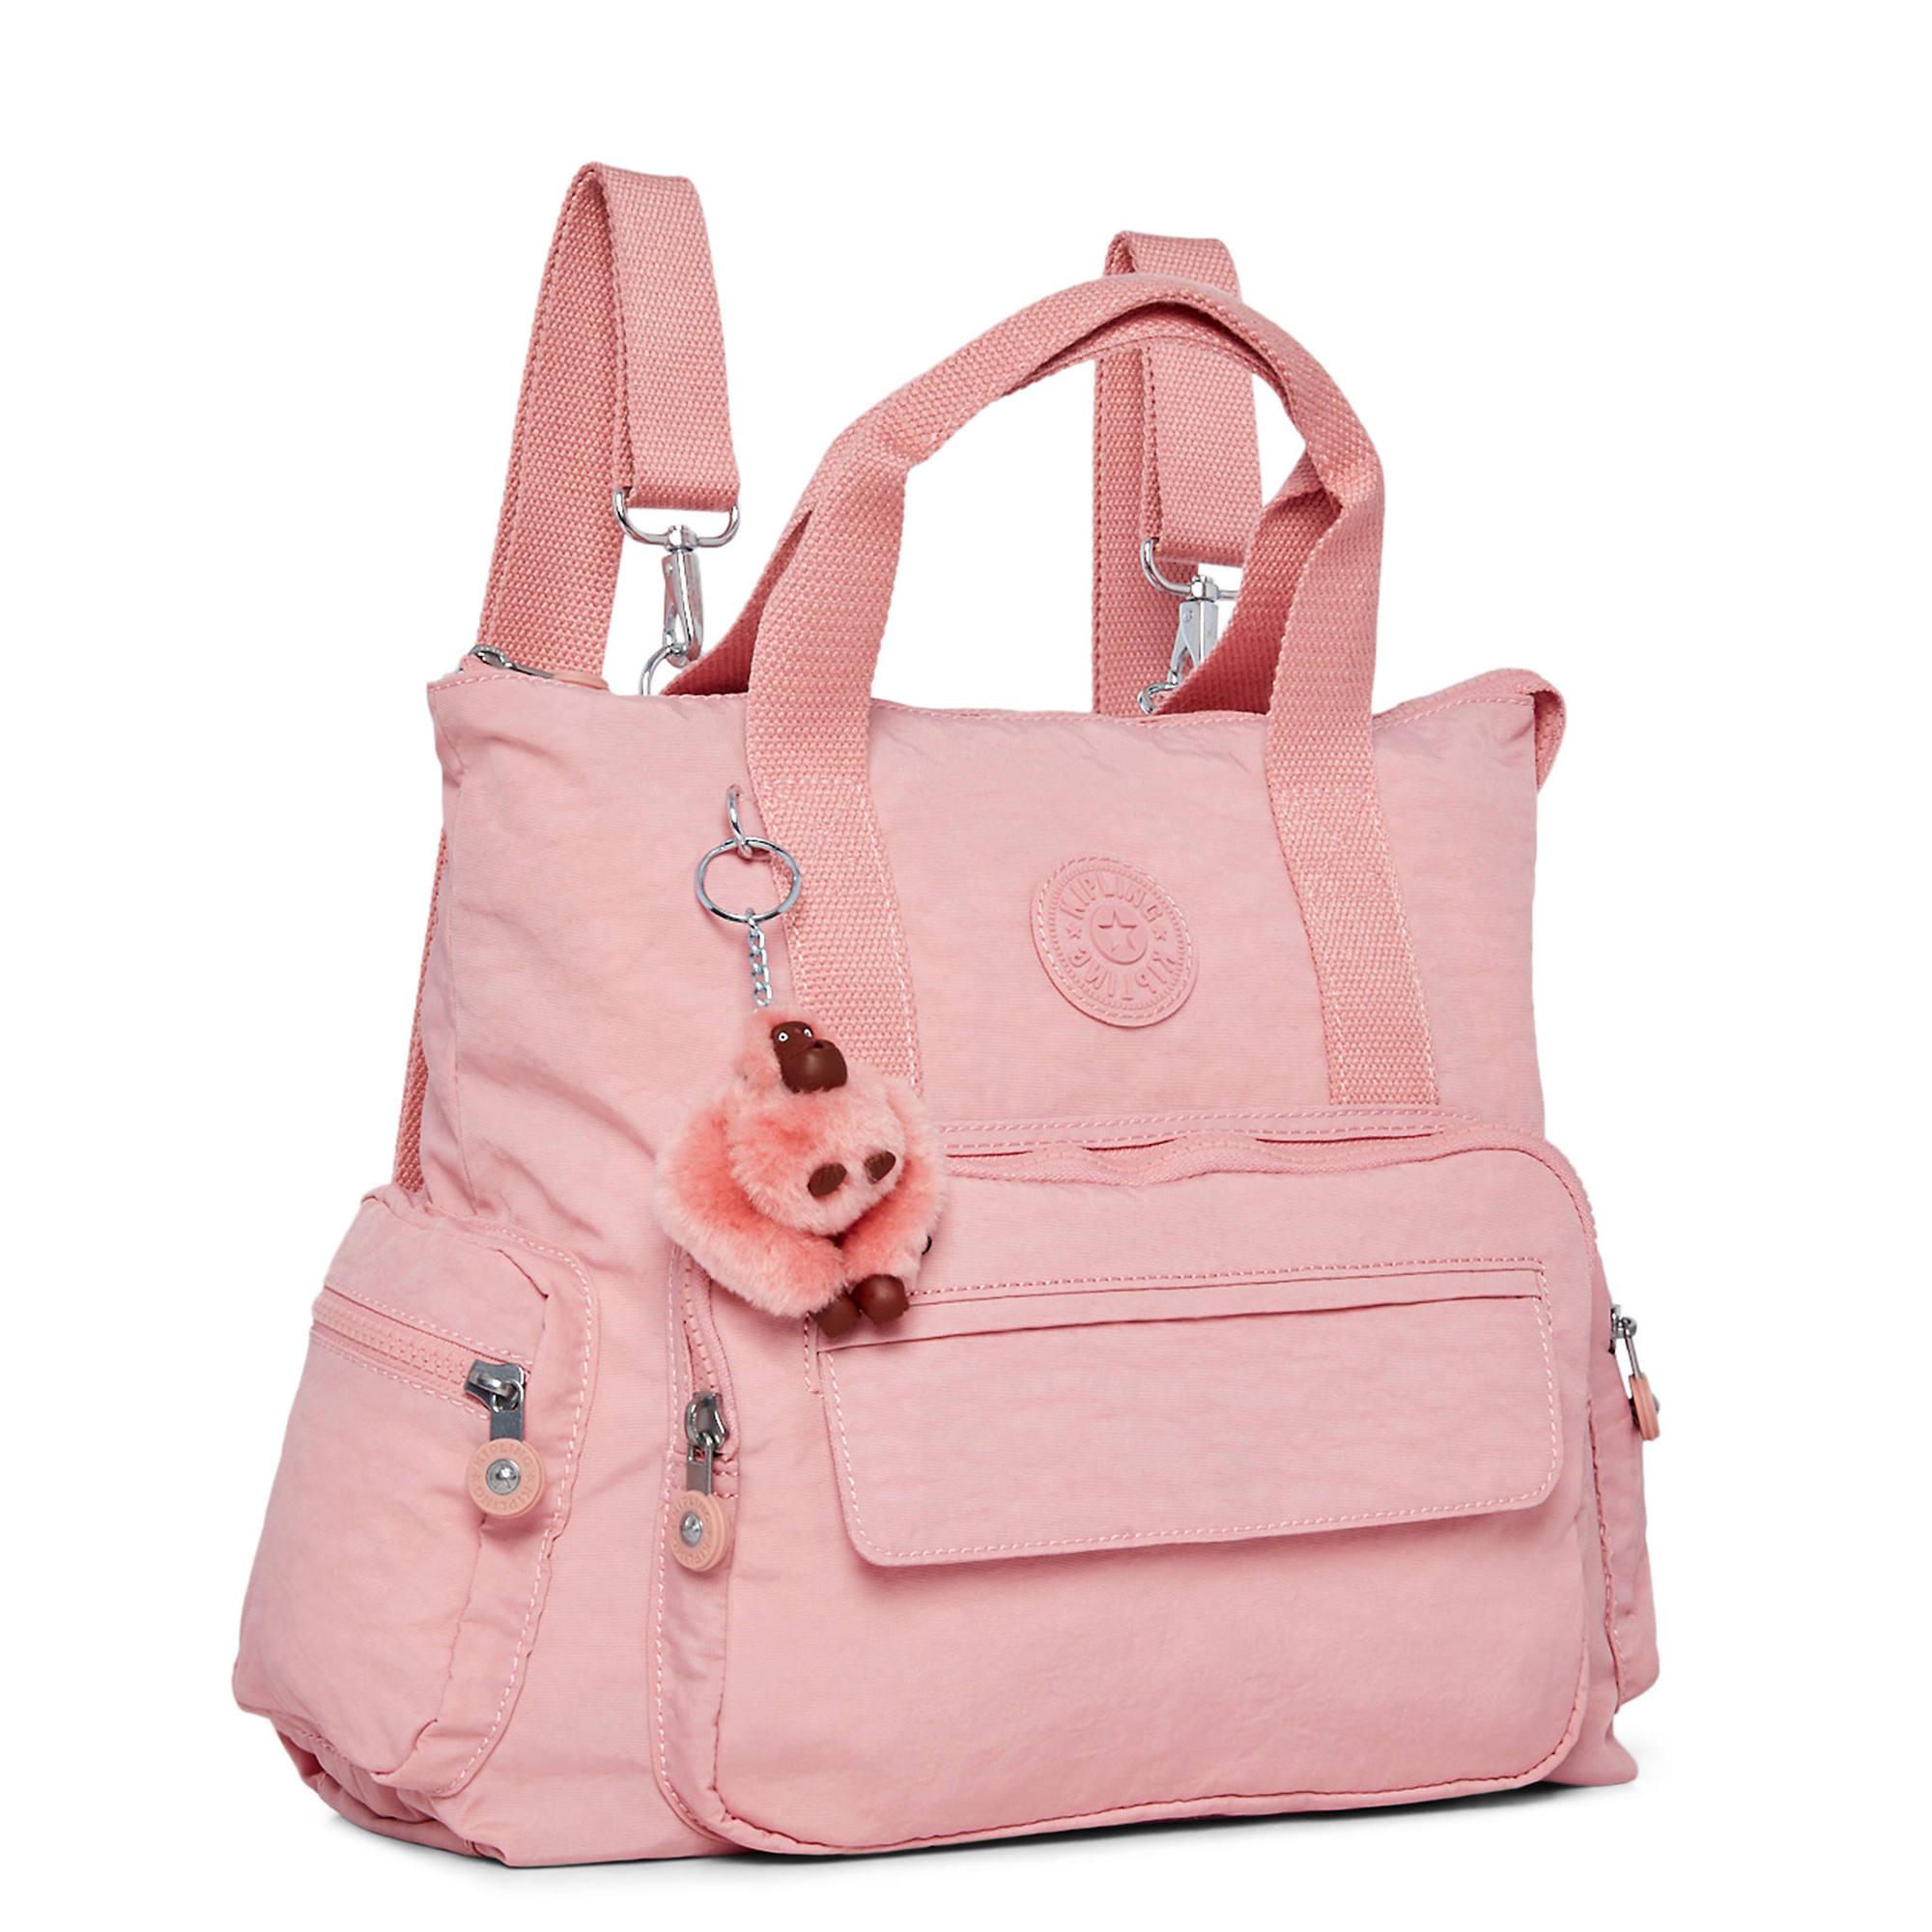 Kipling-Alvy-2-In-1-Convertible-Tote-Bag-Backpack miniatura 38